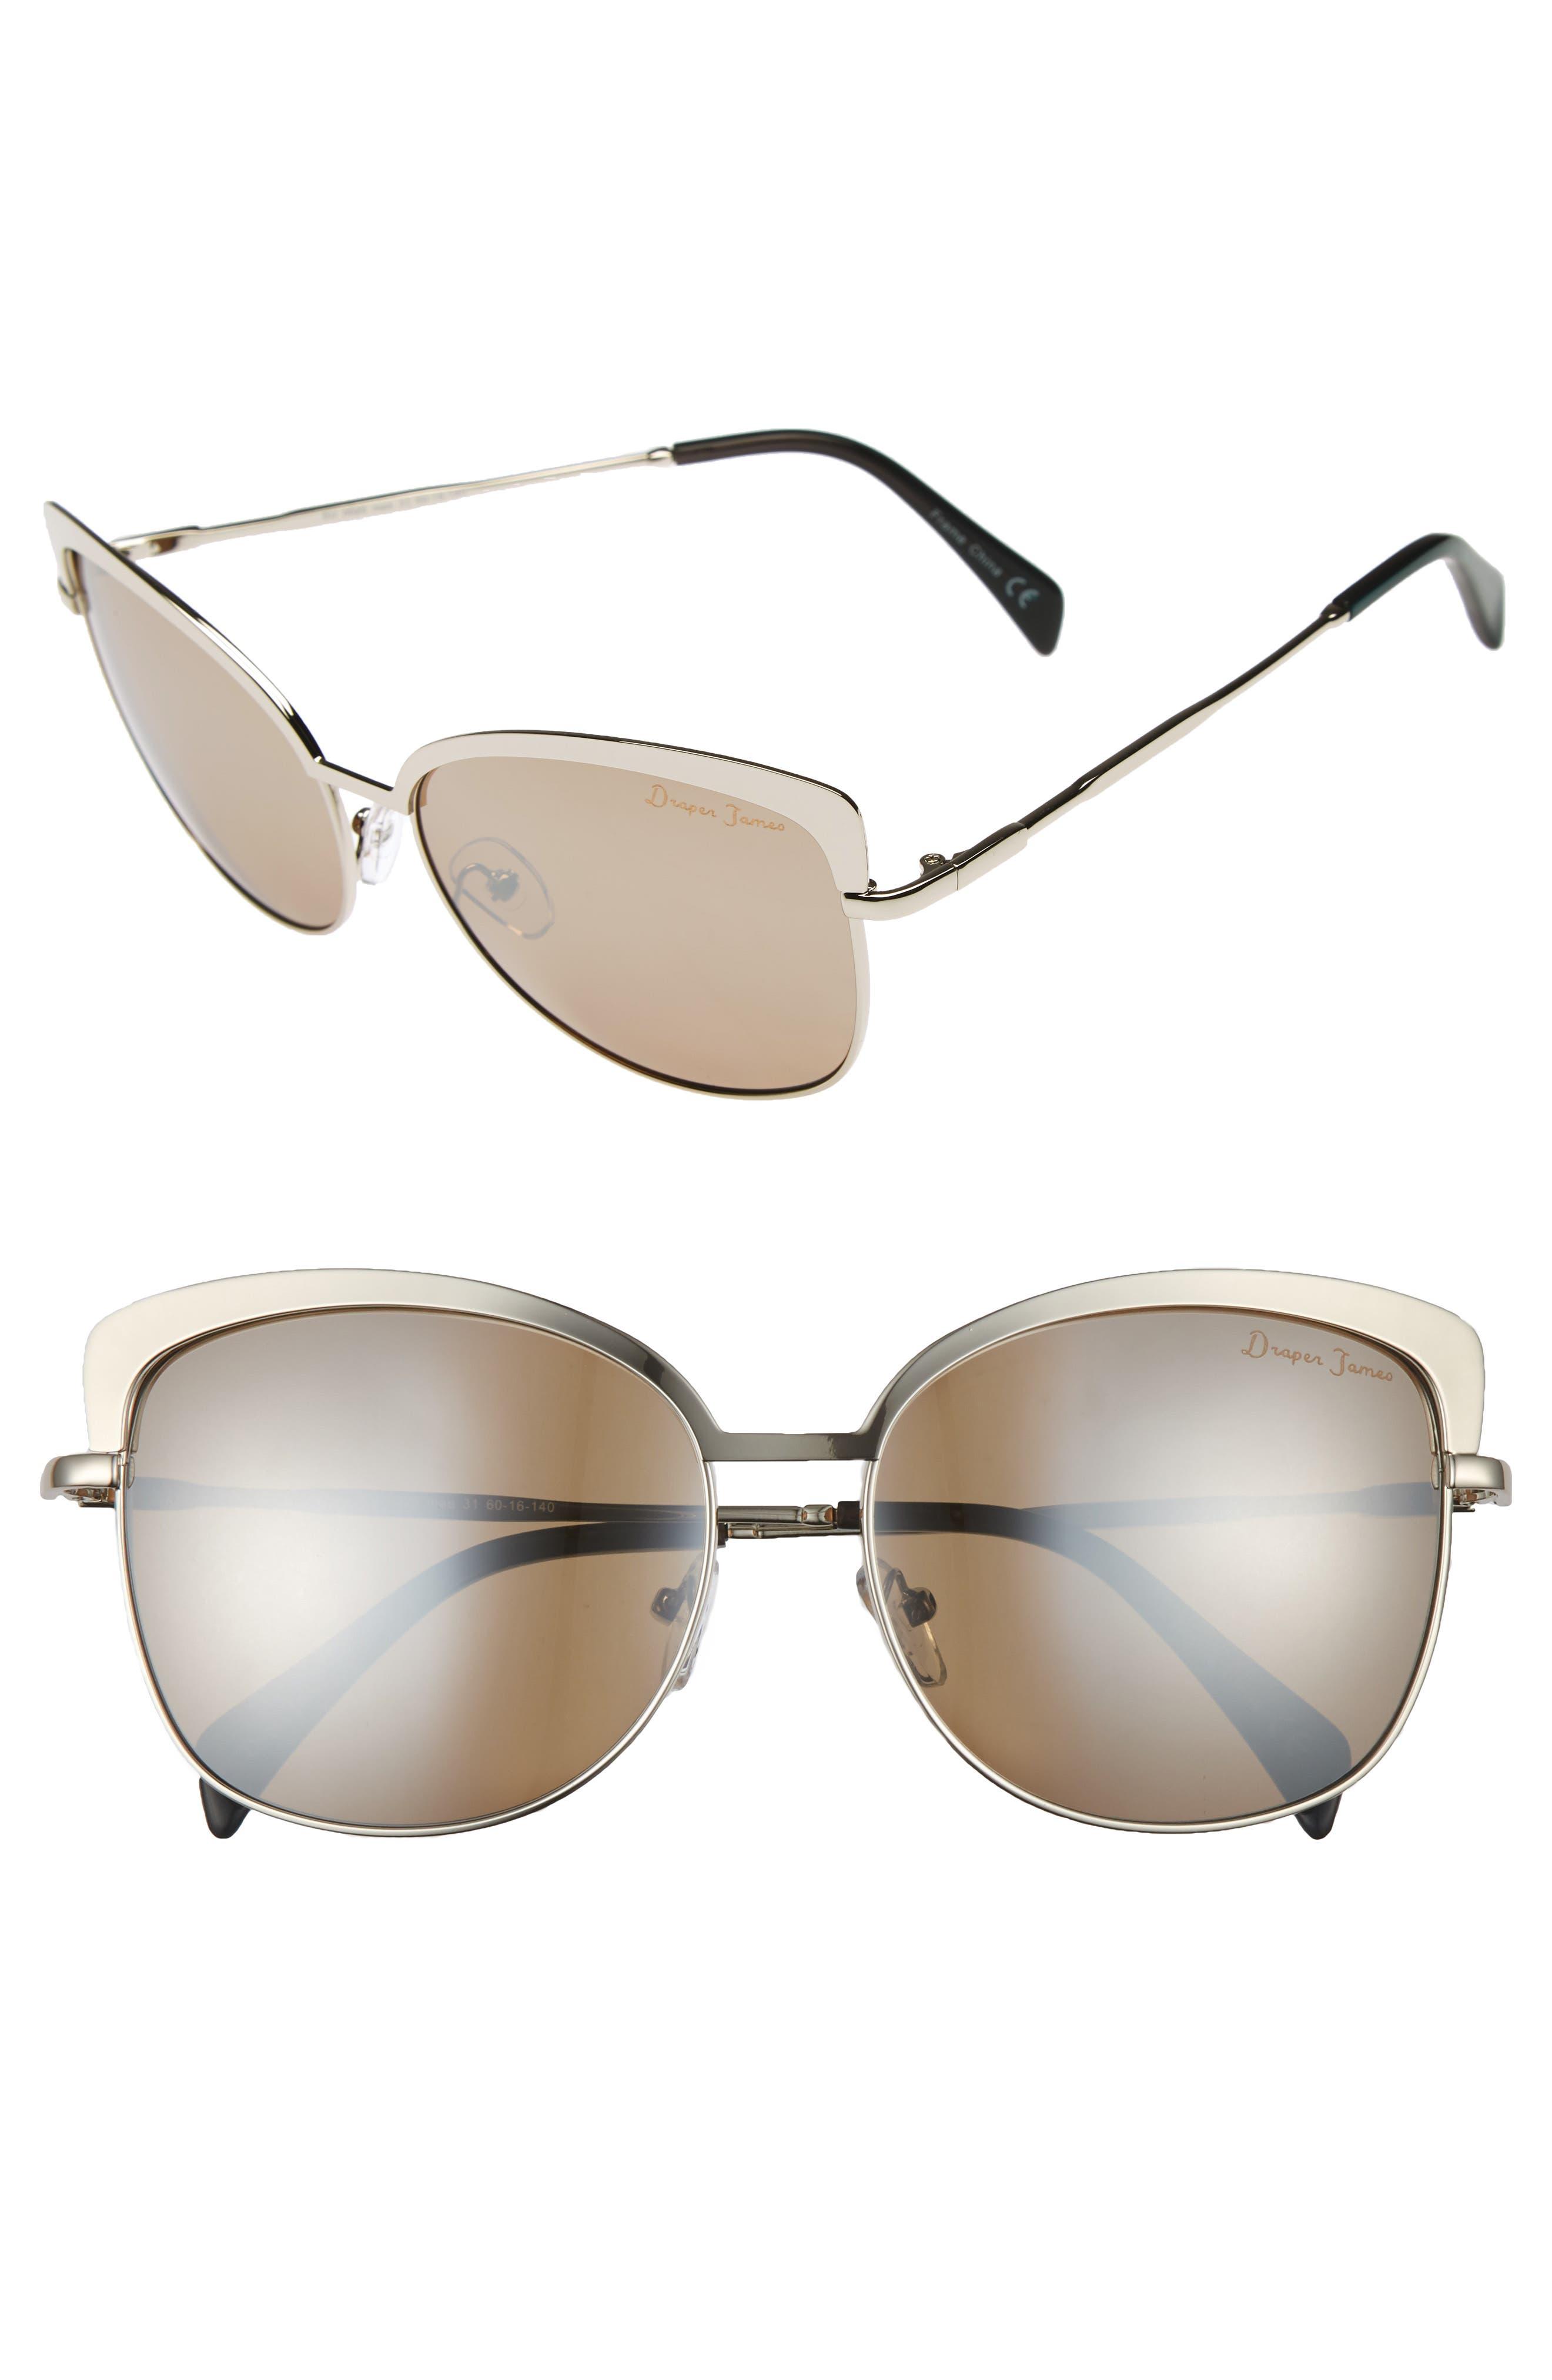 60mm Cat Eye Sunglasses,                             Main thumbnail 1, color,                             SHINY GUNMETAL